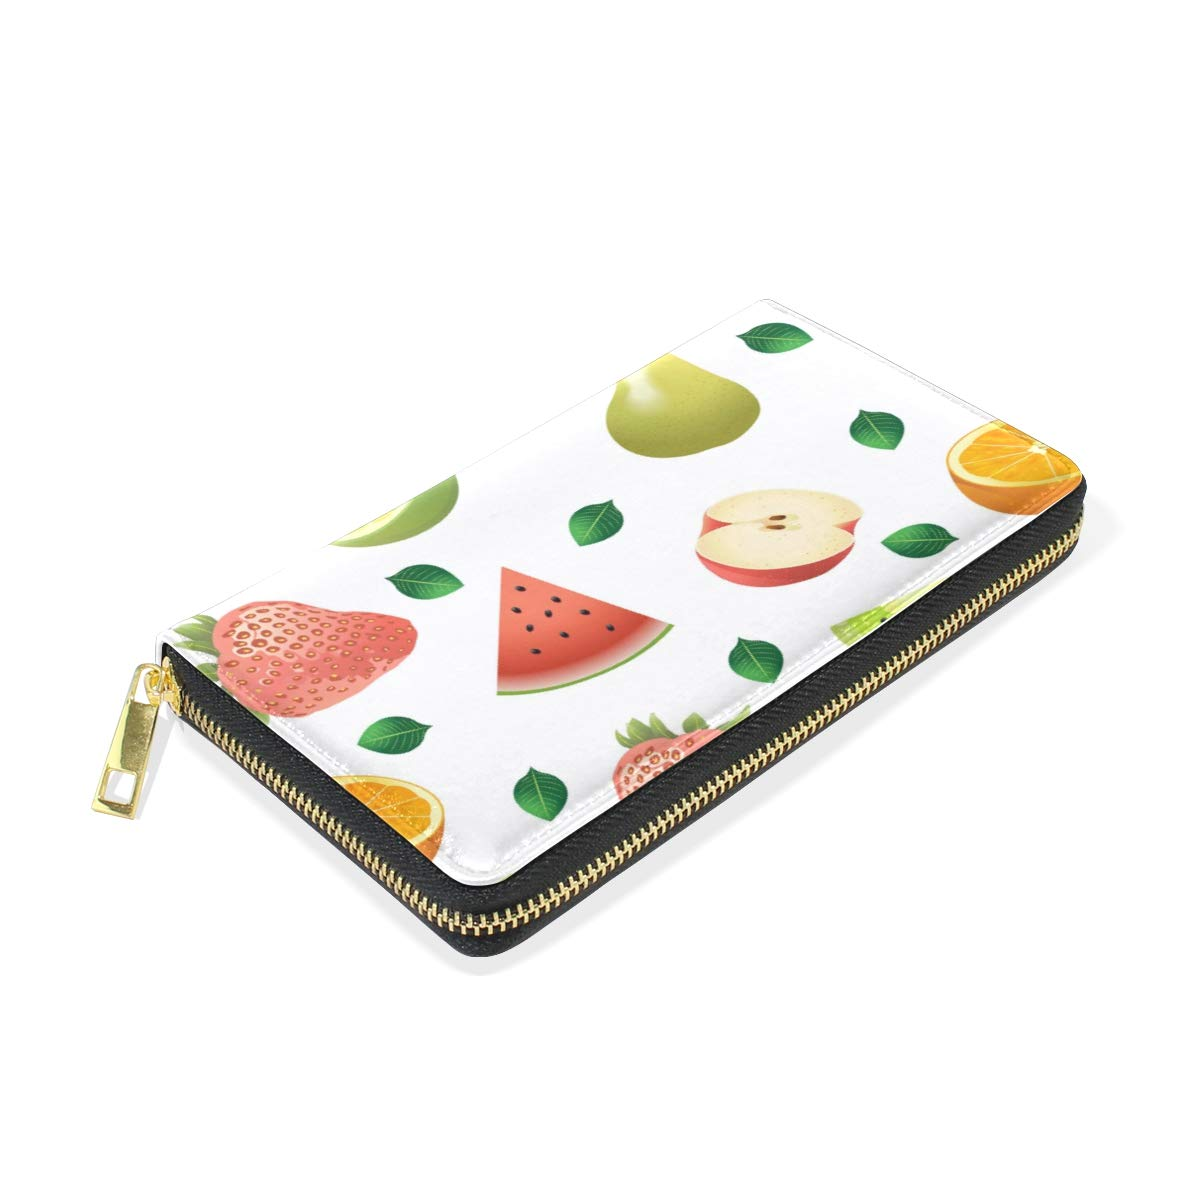 Women Wallet Coin Purse Phone Clutch Pouch Cash Bag Female Girl Card Change Holder Organizer Storage Key Hold Leather Elegant Handbag Party Birthday Gift Fruit